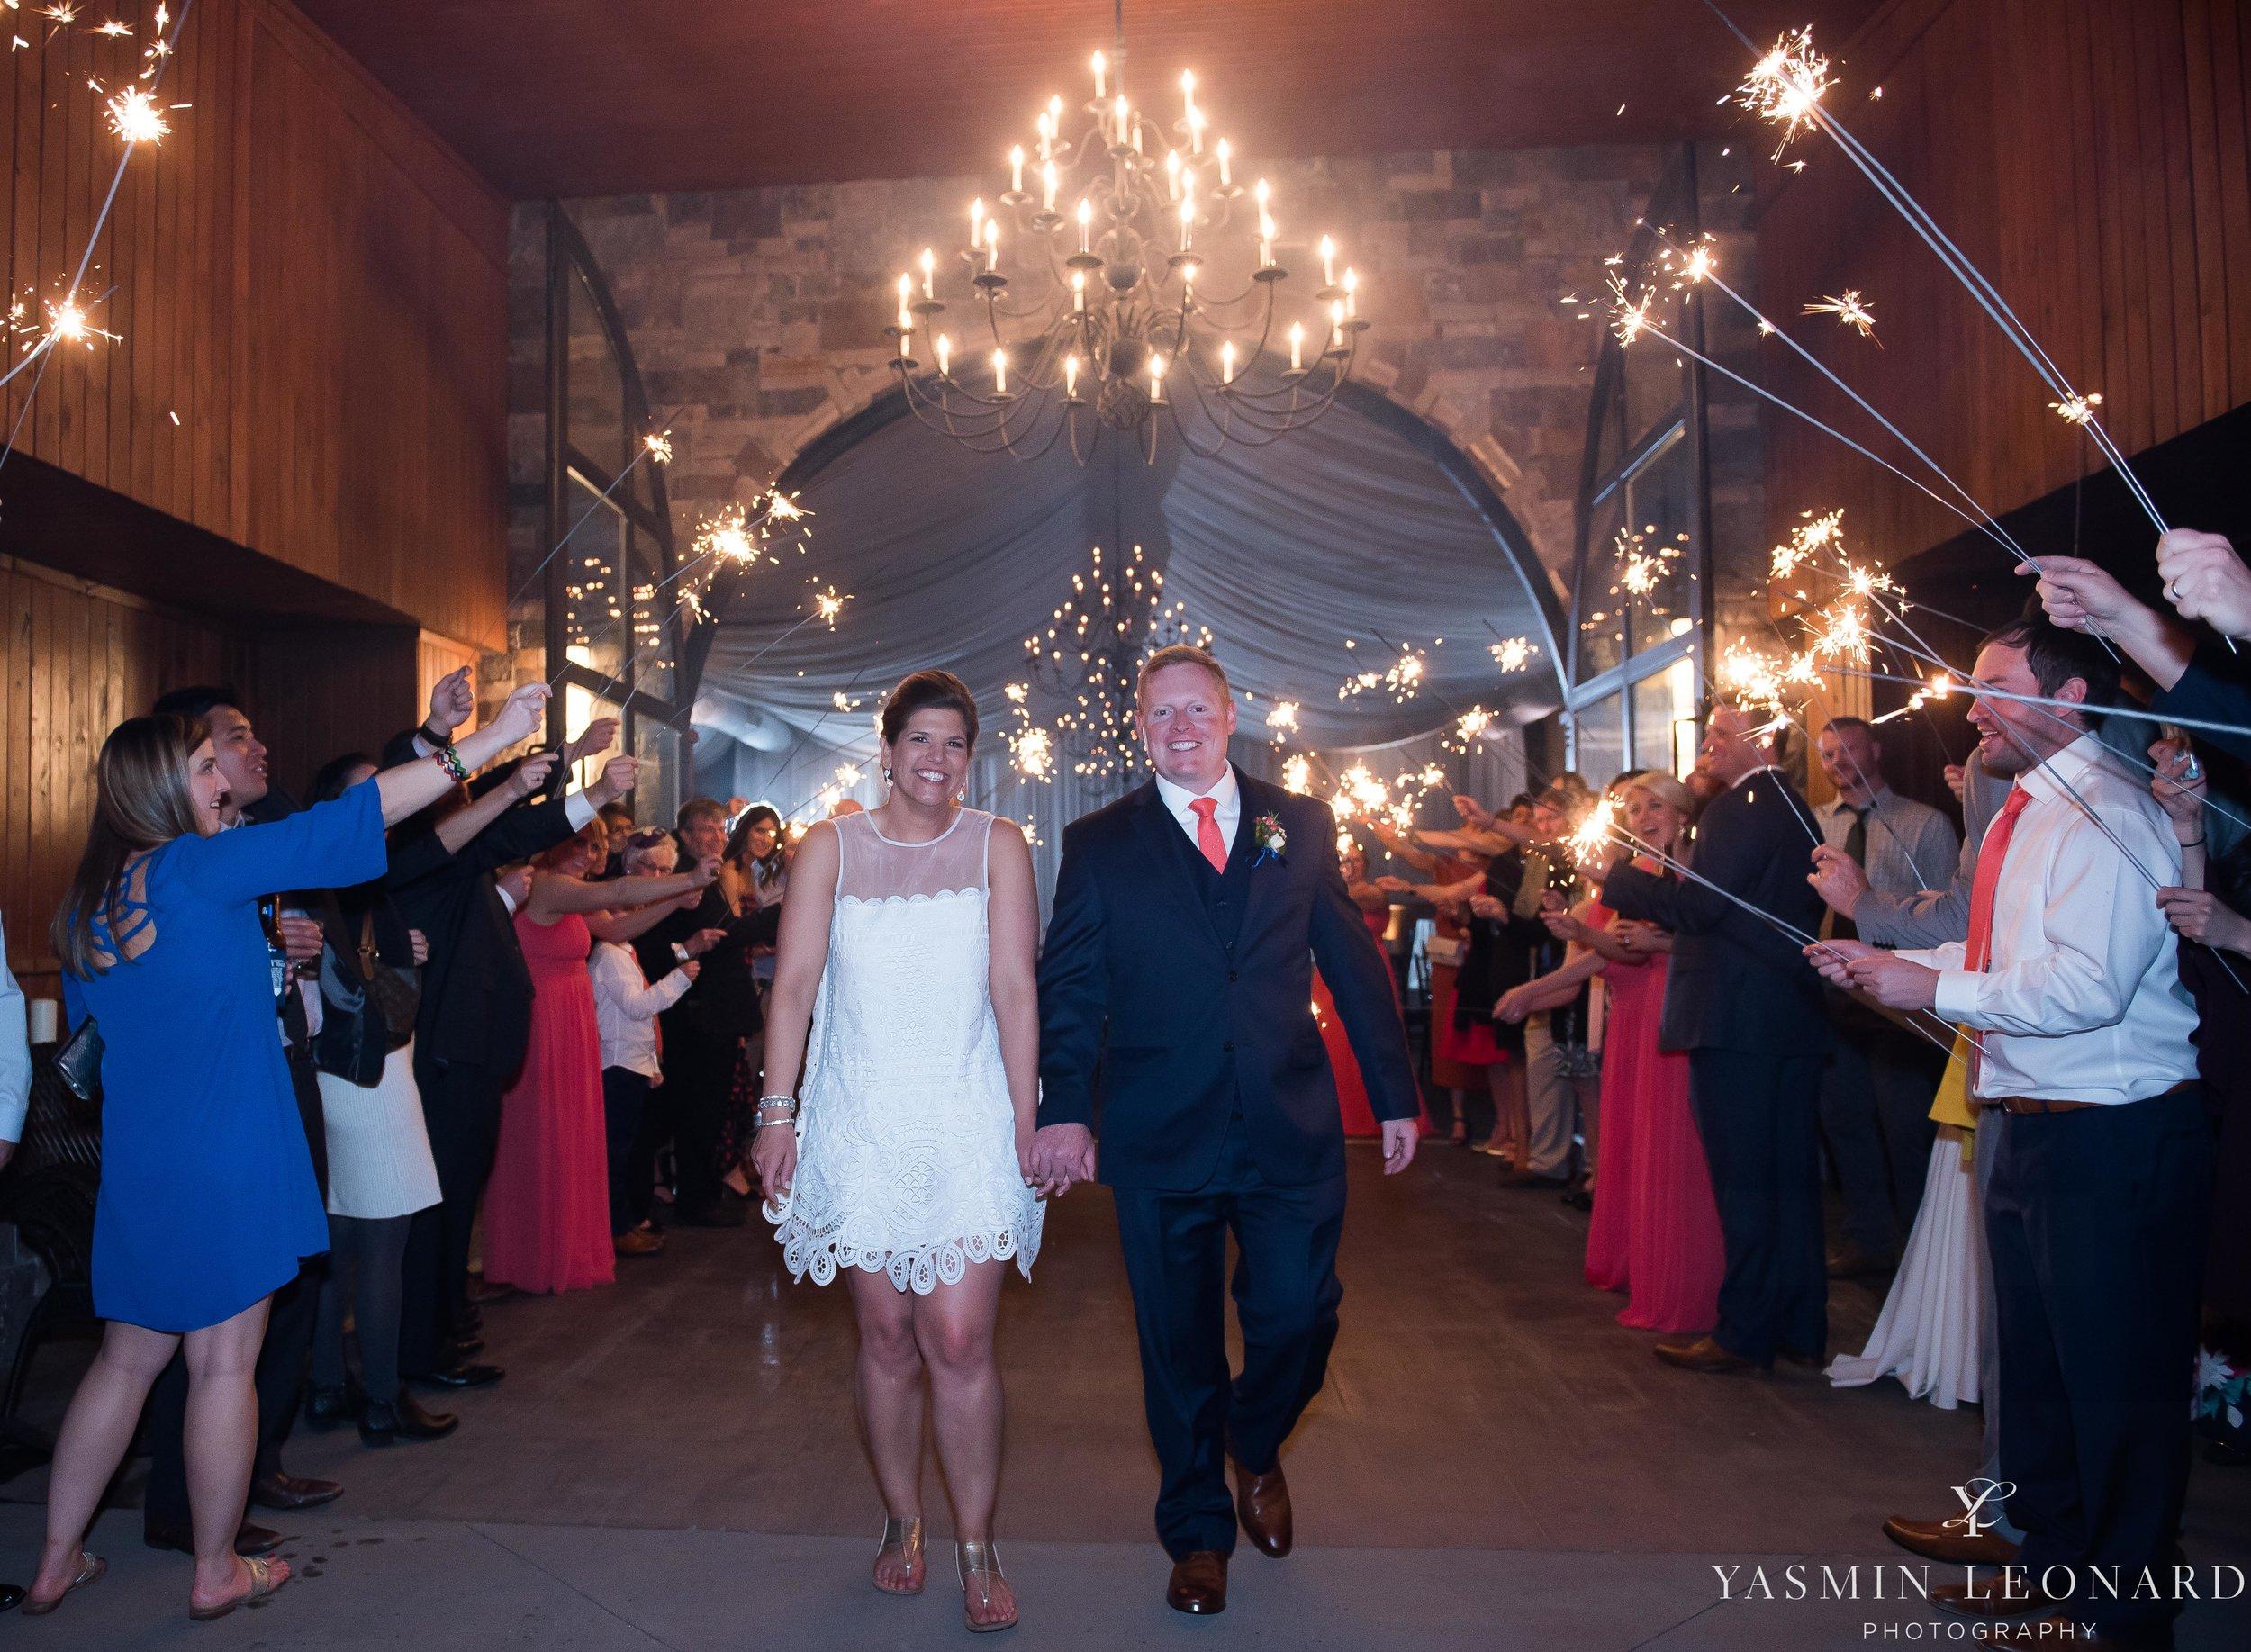 Adaumont Farm - Adaumont Farm Weddings - Trinity Weddings - NC Weddings - Yasmin Leonard Photography-106.jpg